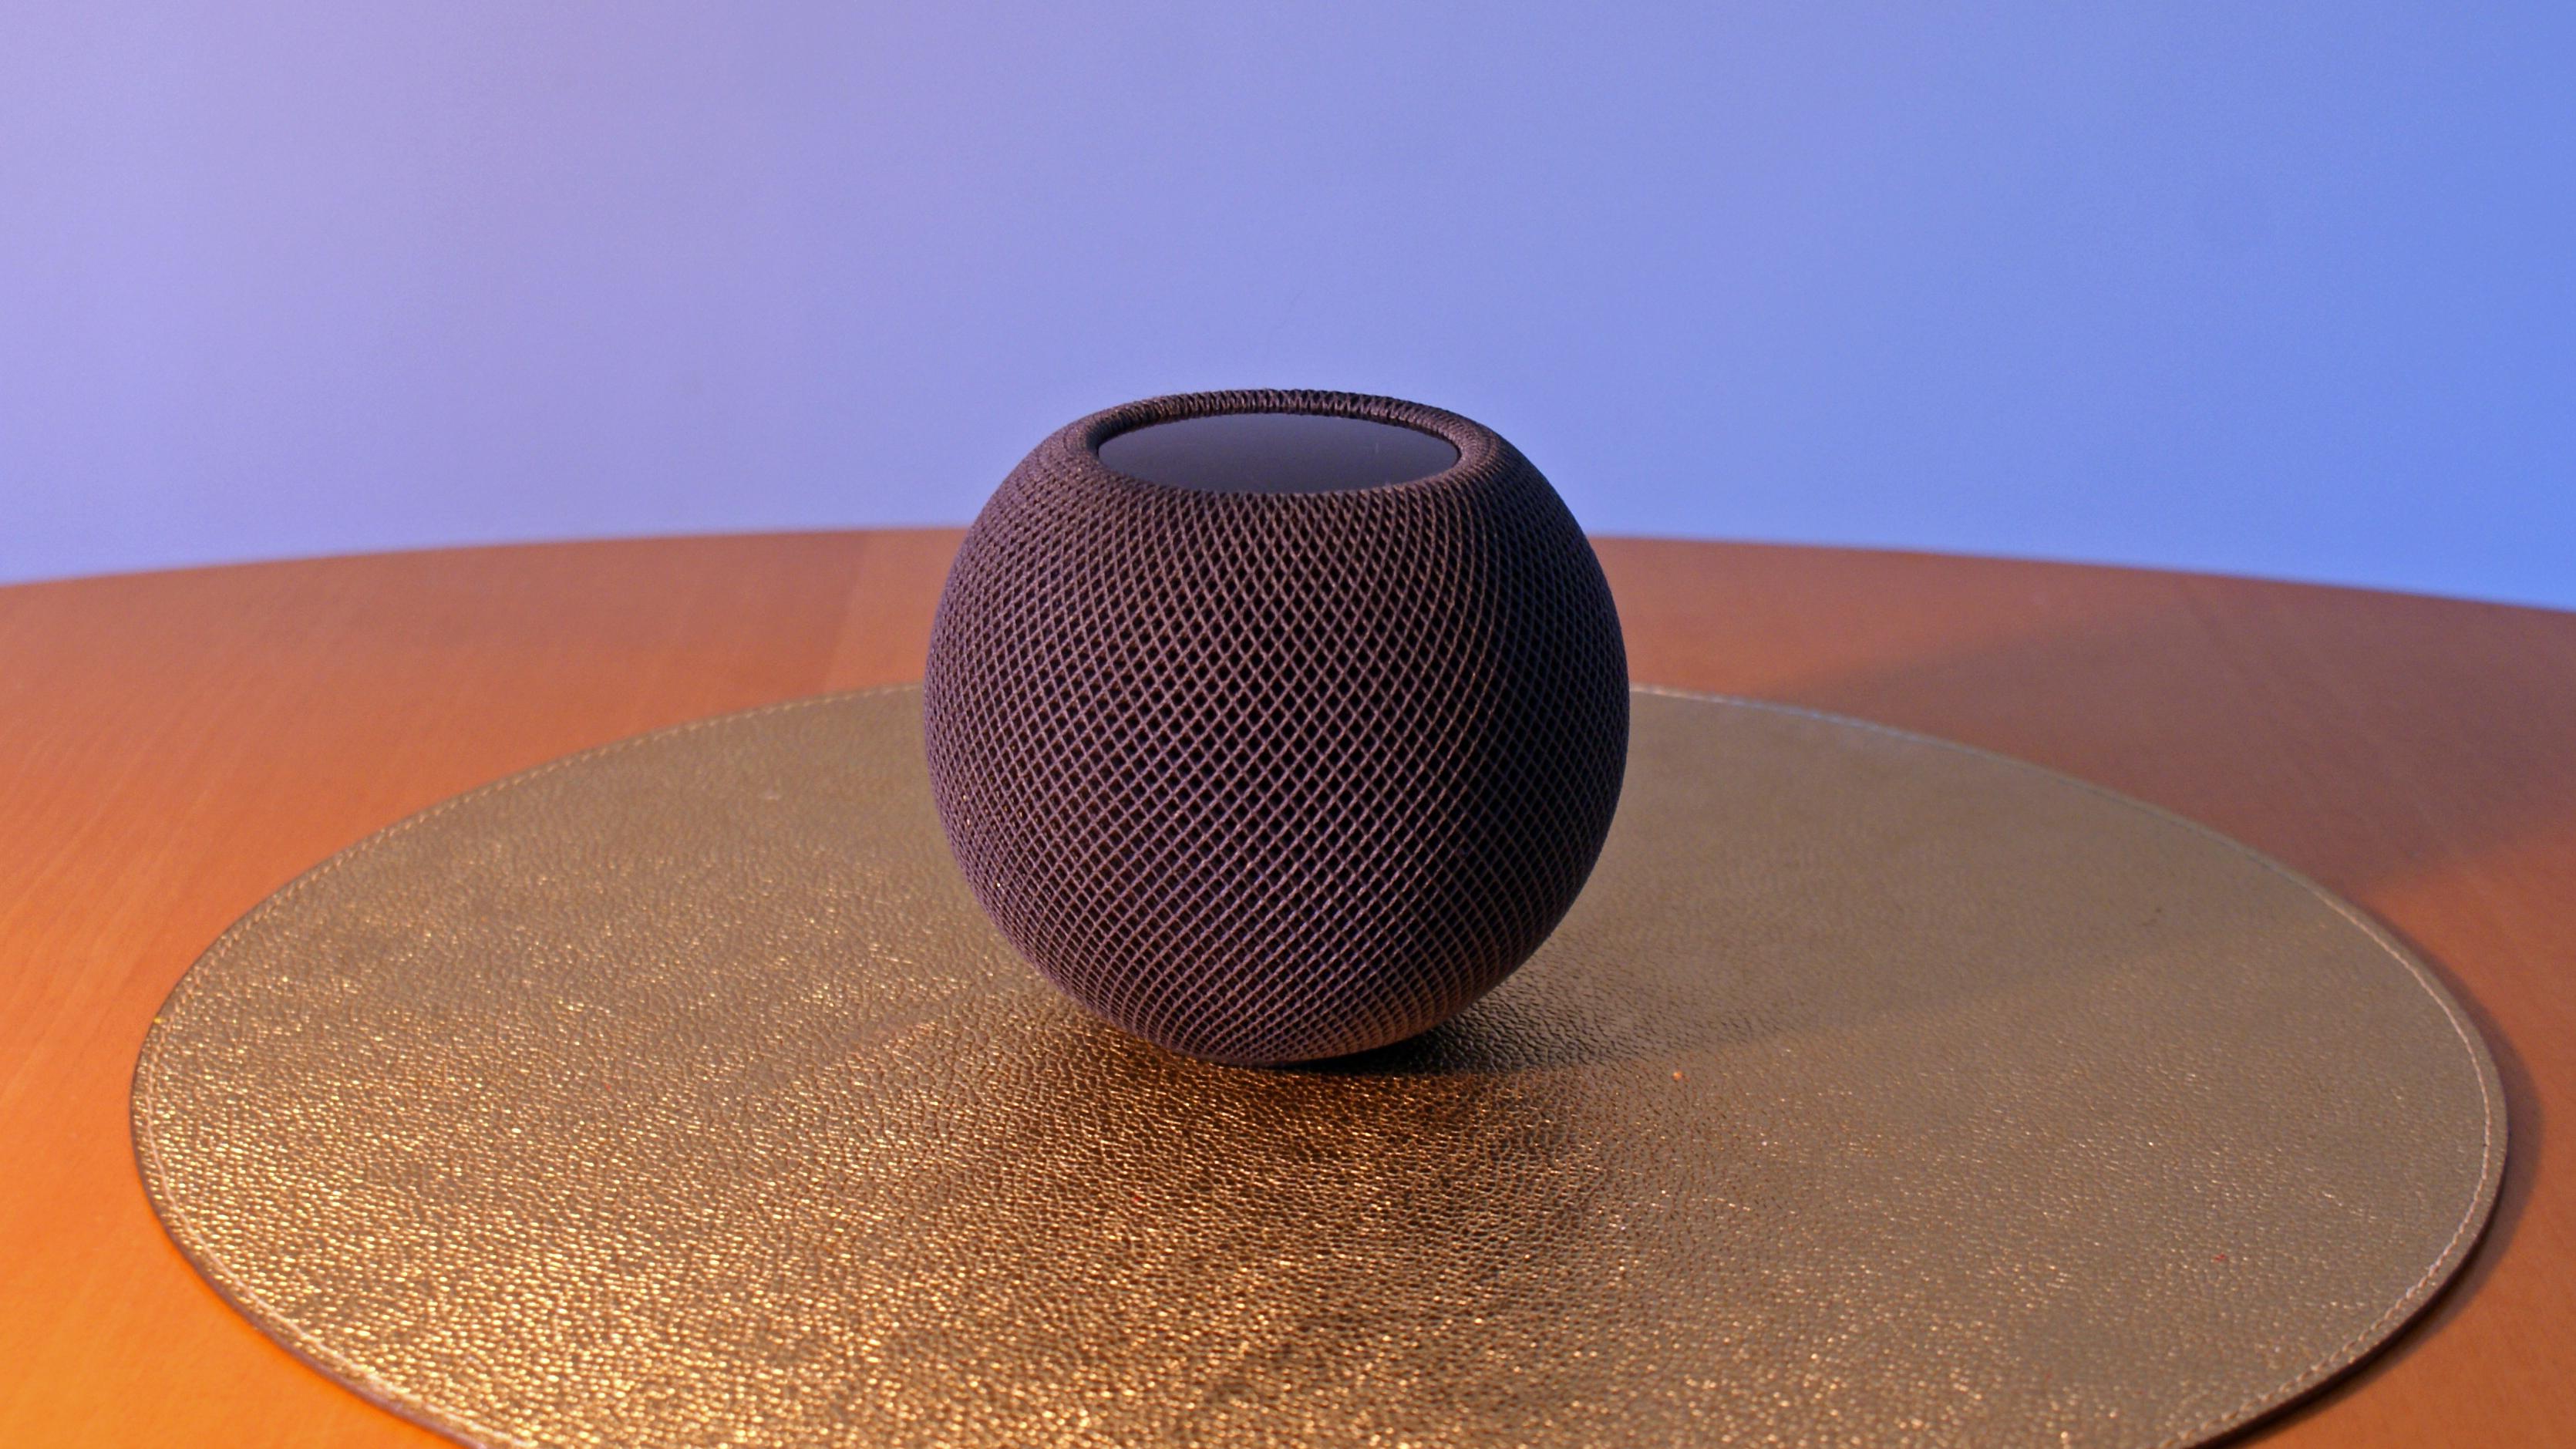 A HomePod mini on a table